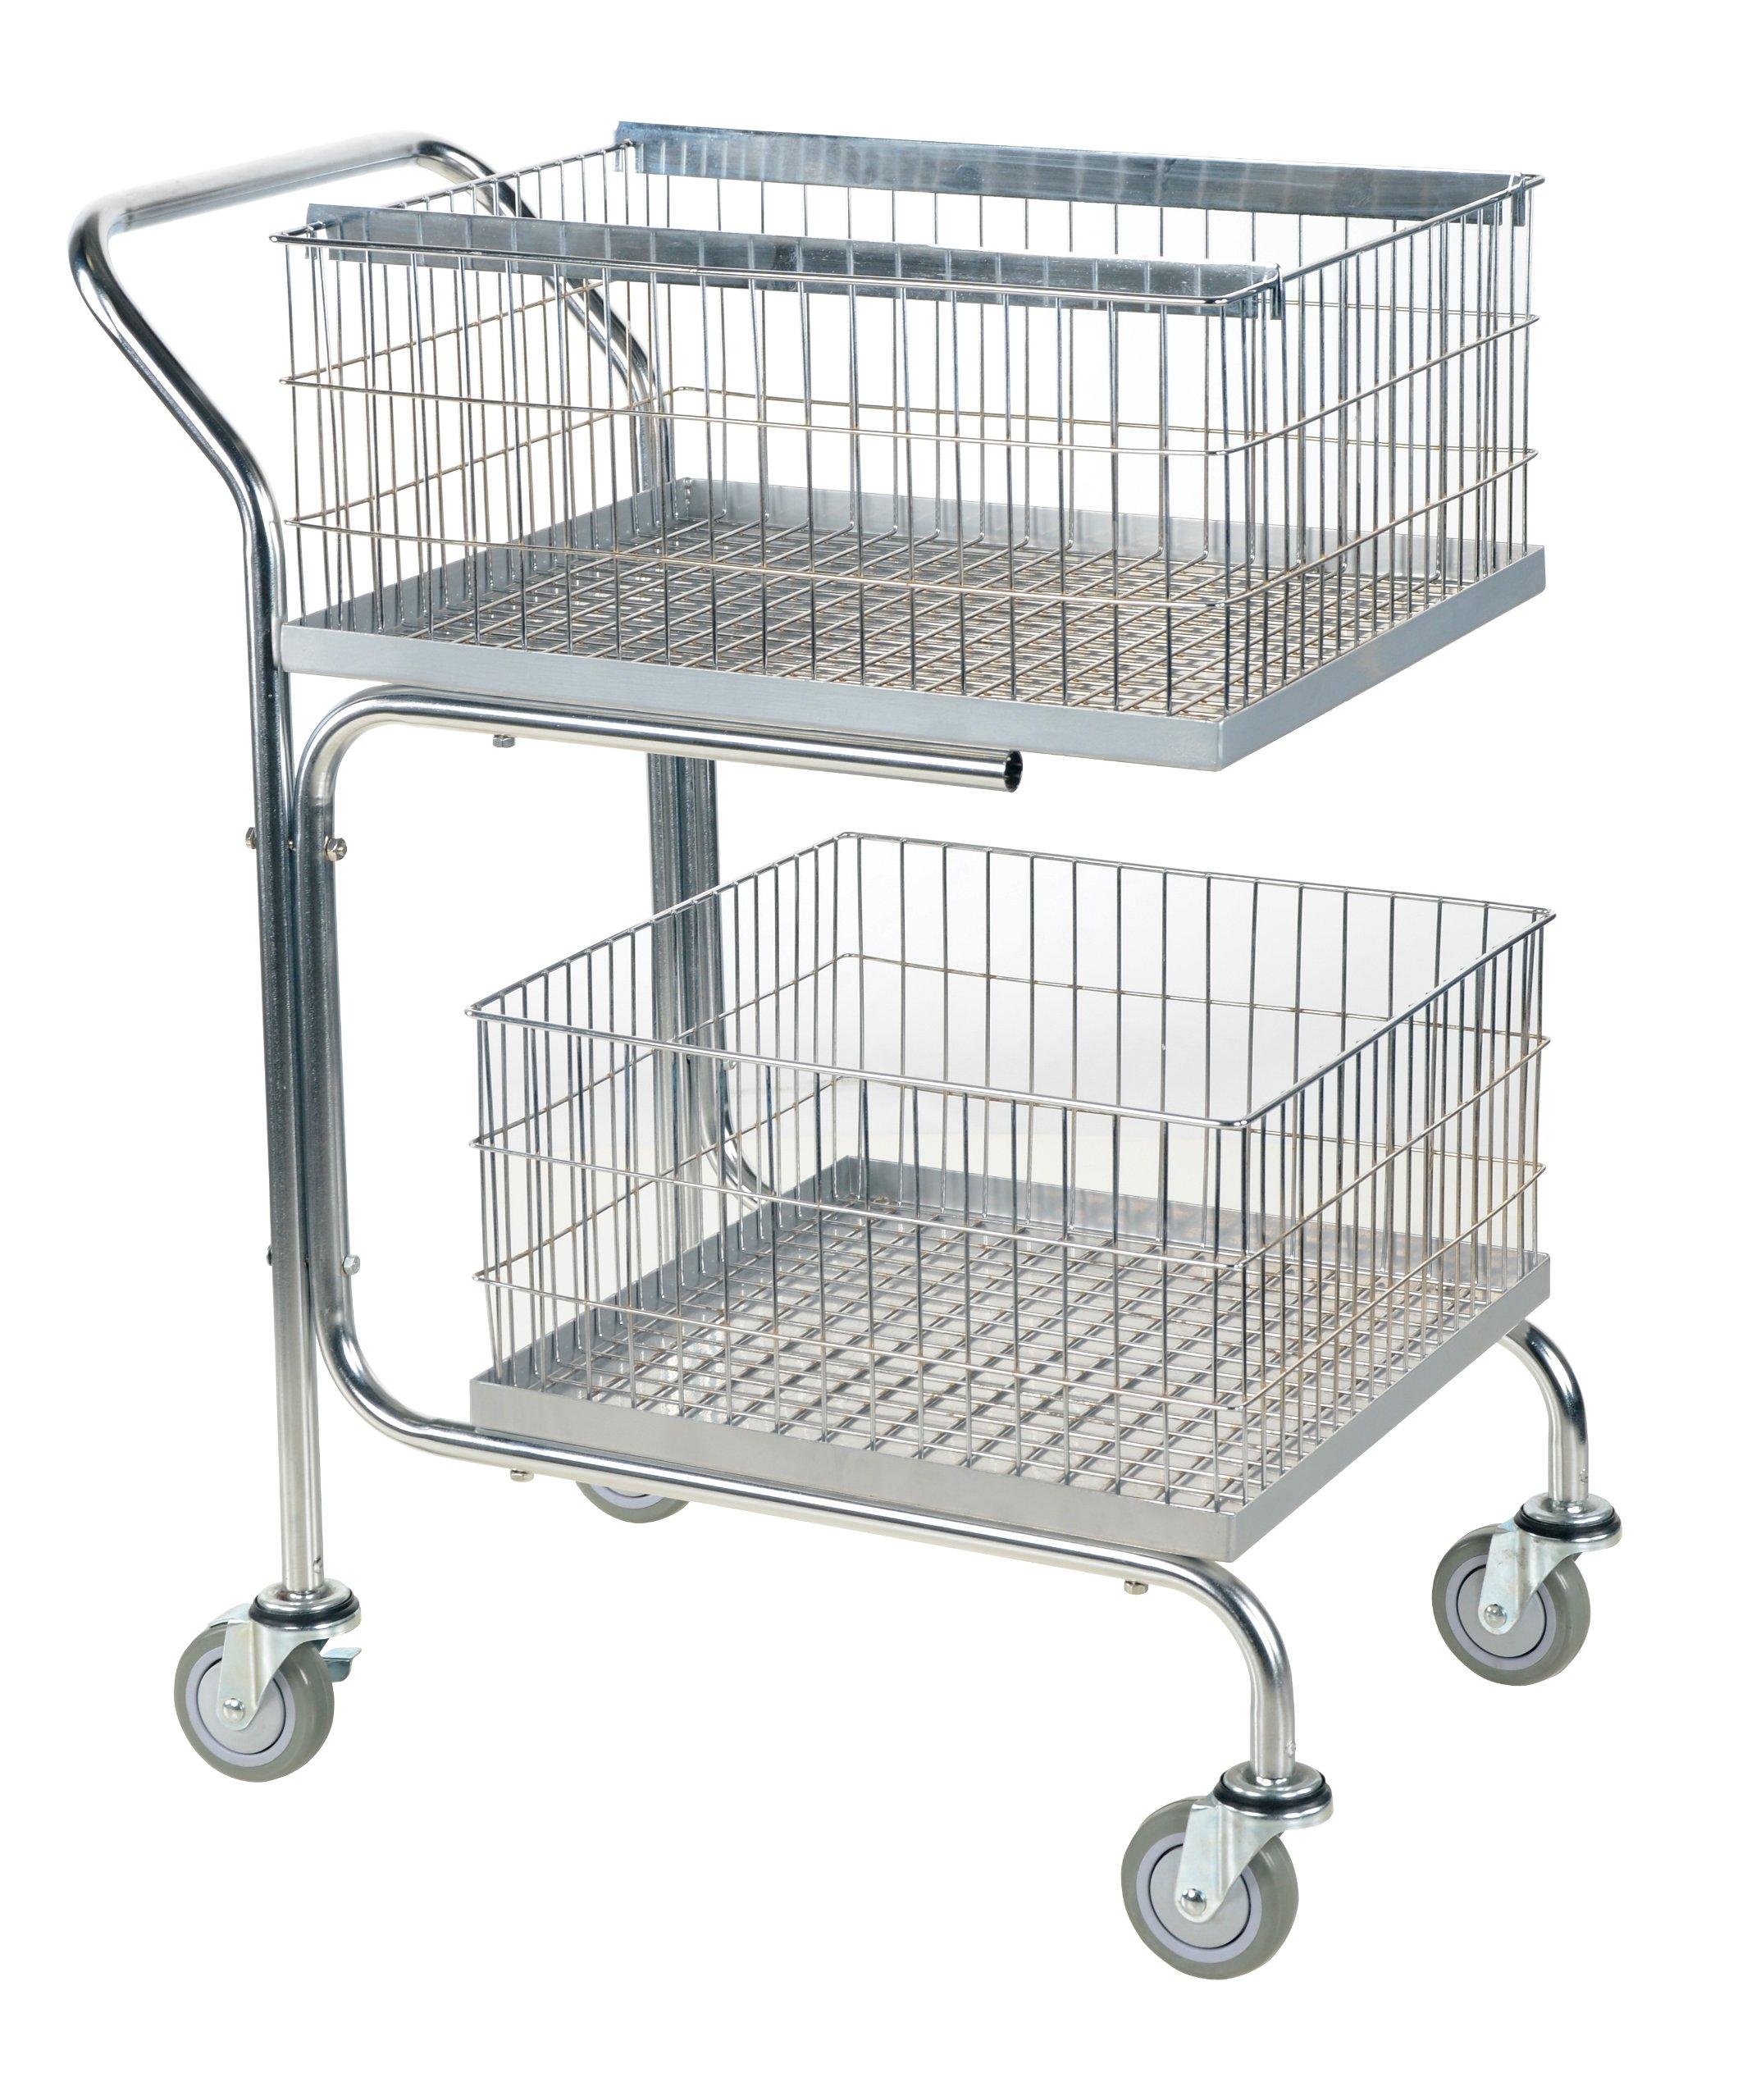 Vestil MAIL-55 Steel 2 Trays Cart, 200-lb. Load Capacity, 39'' x 18'' x 31''